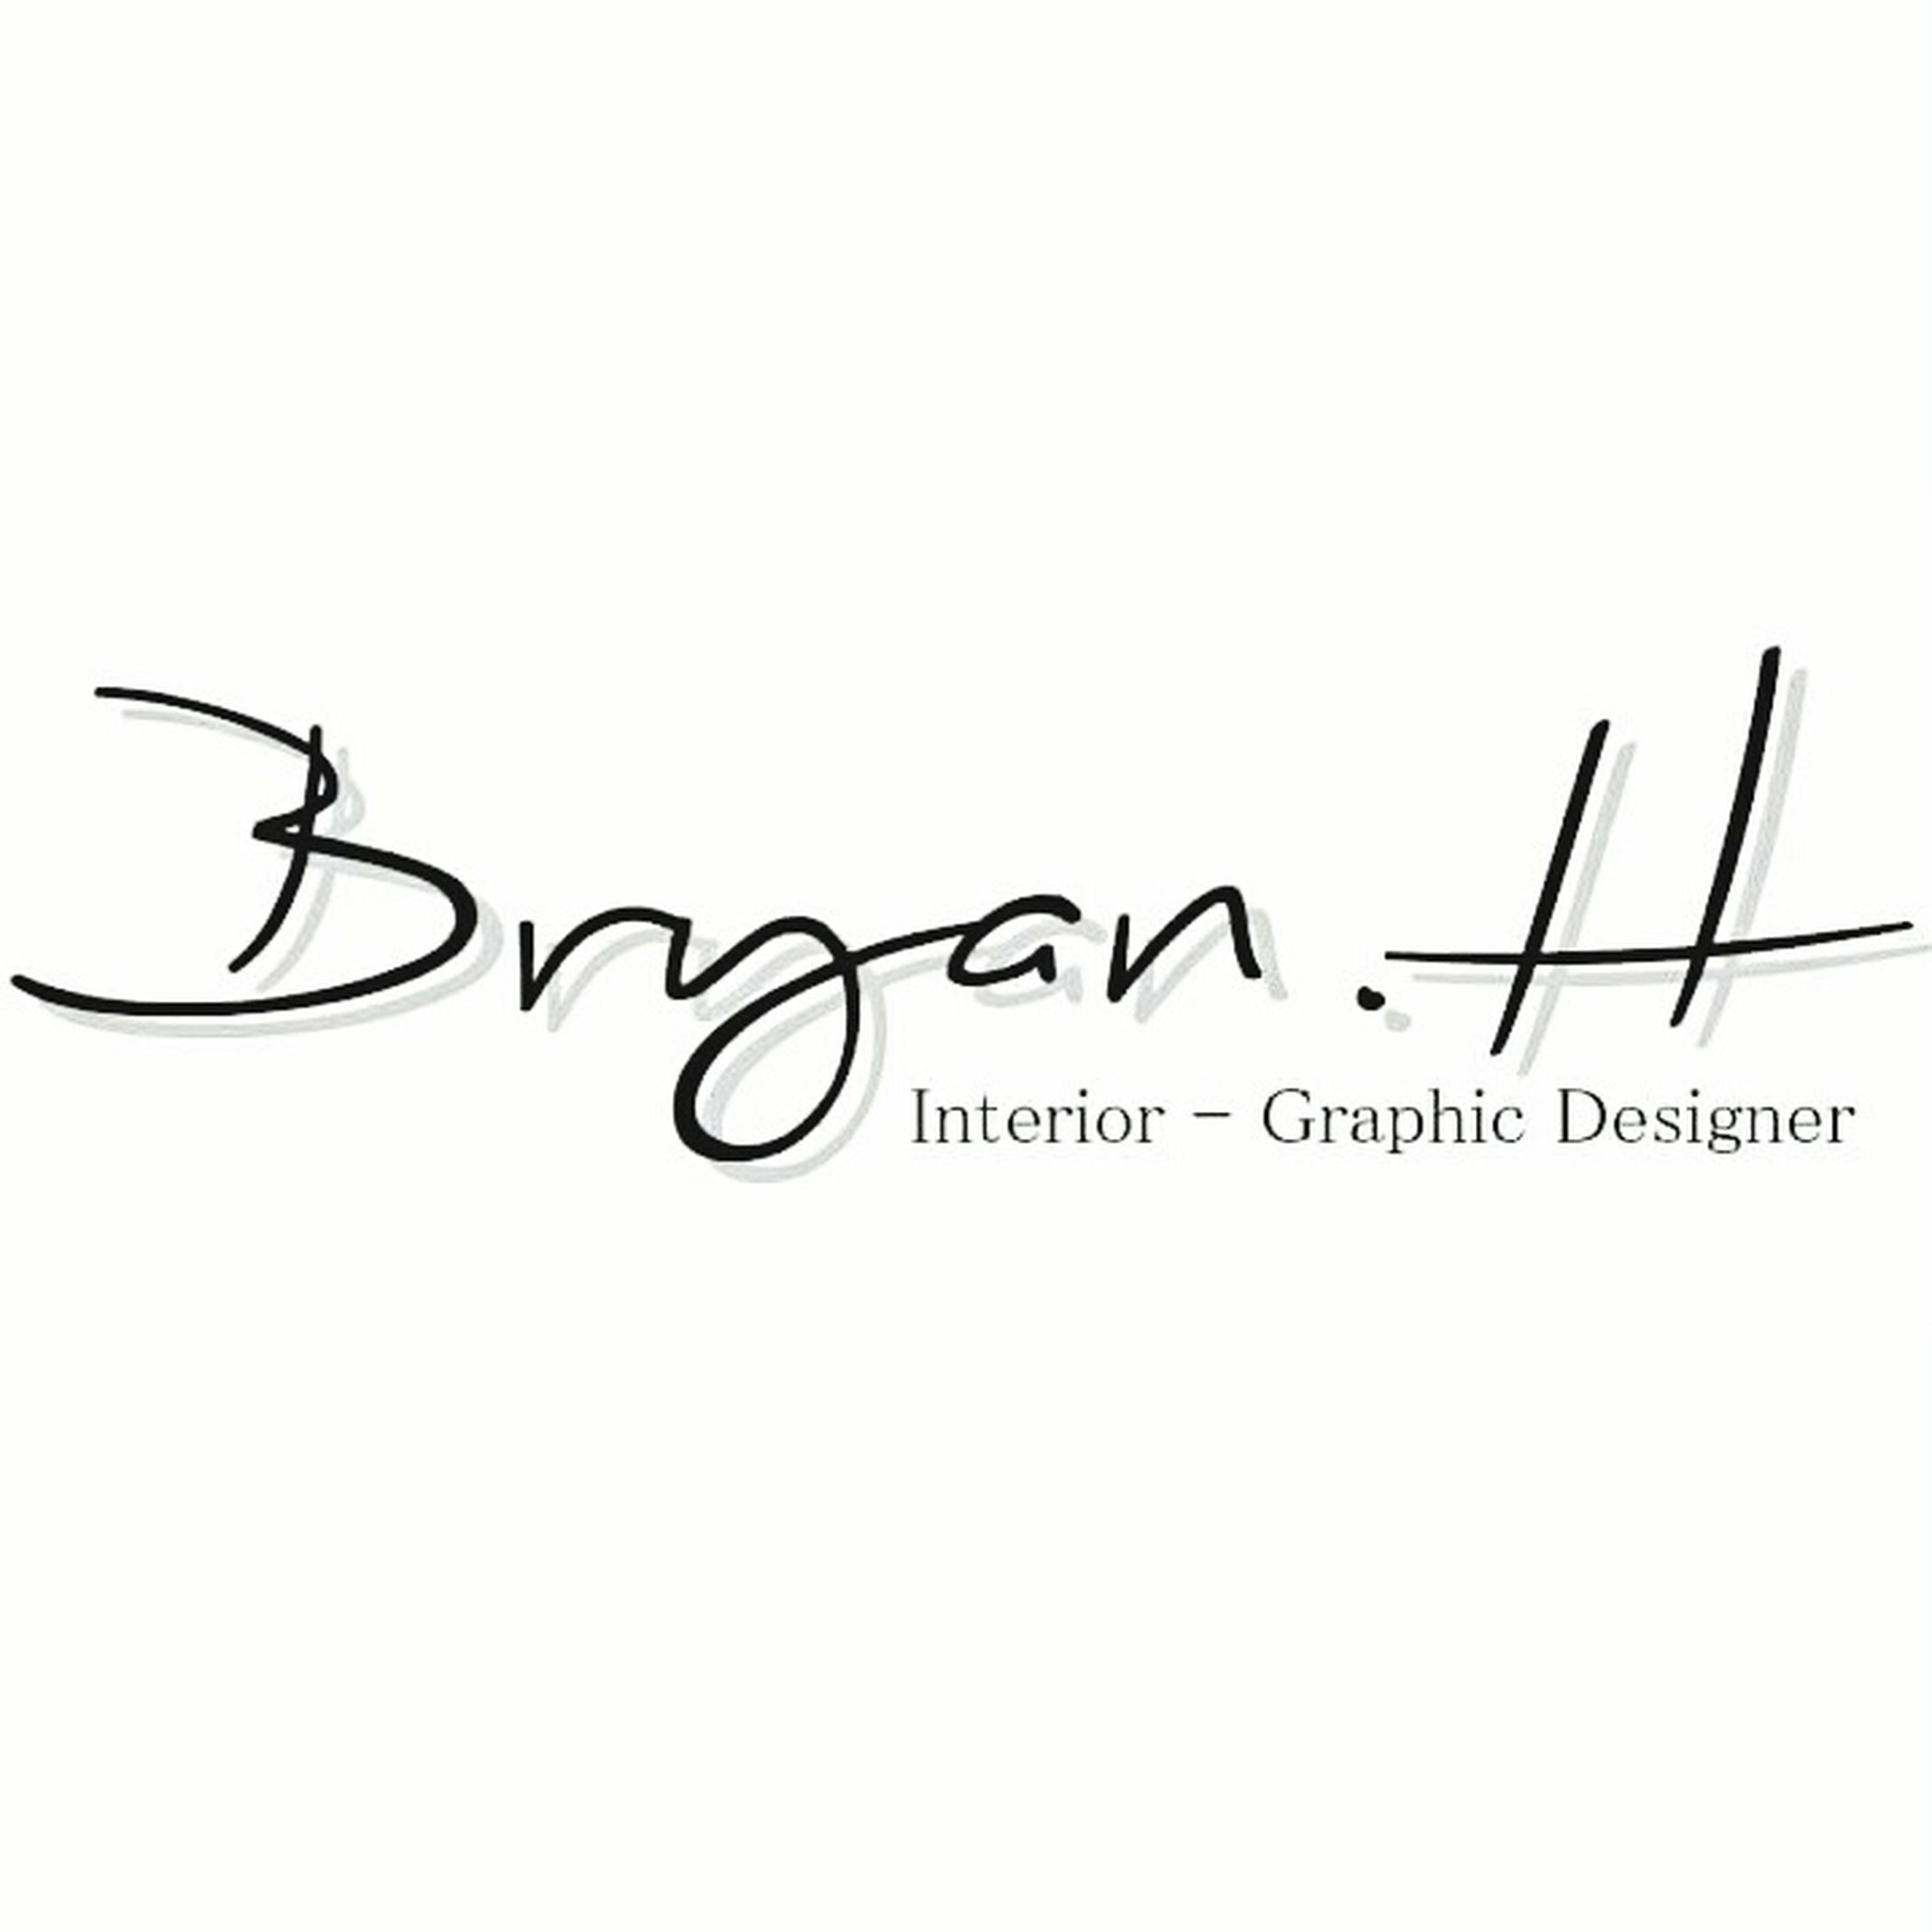 Bryan Bryanhdesign Bryanhdesigner Design Designer  Interior Interiordesign Interiordesigner Graphicdesign Graphicdesigner SketchUp Illustrator Photoshop Corelstudio 3D Aftereffect Saigon Saigongraphic Saigon Vietnam